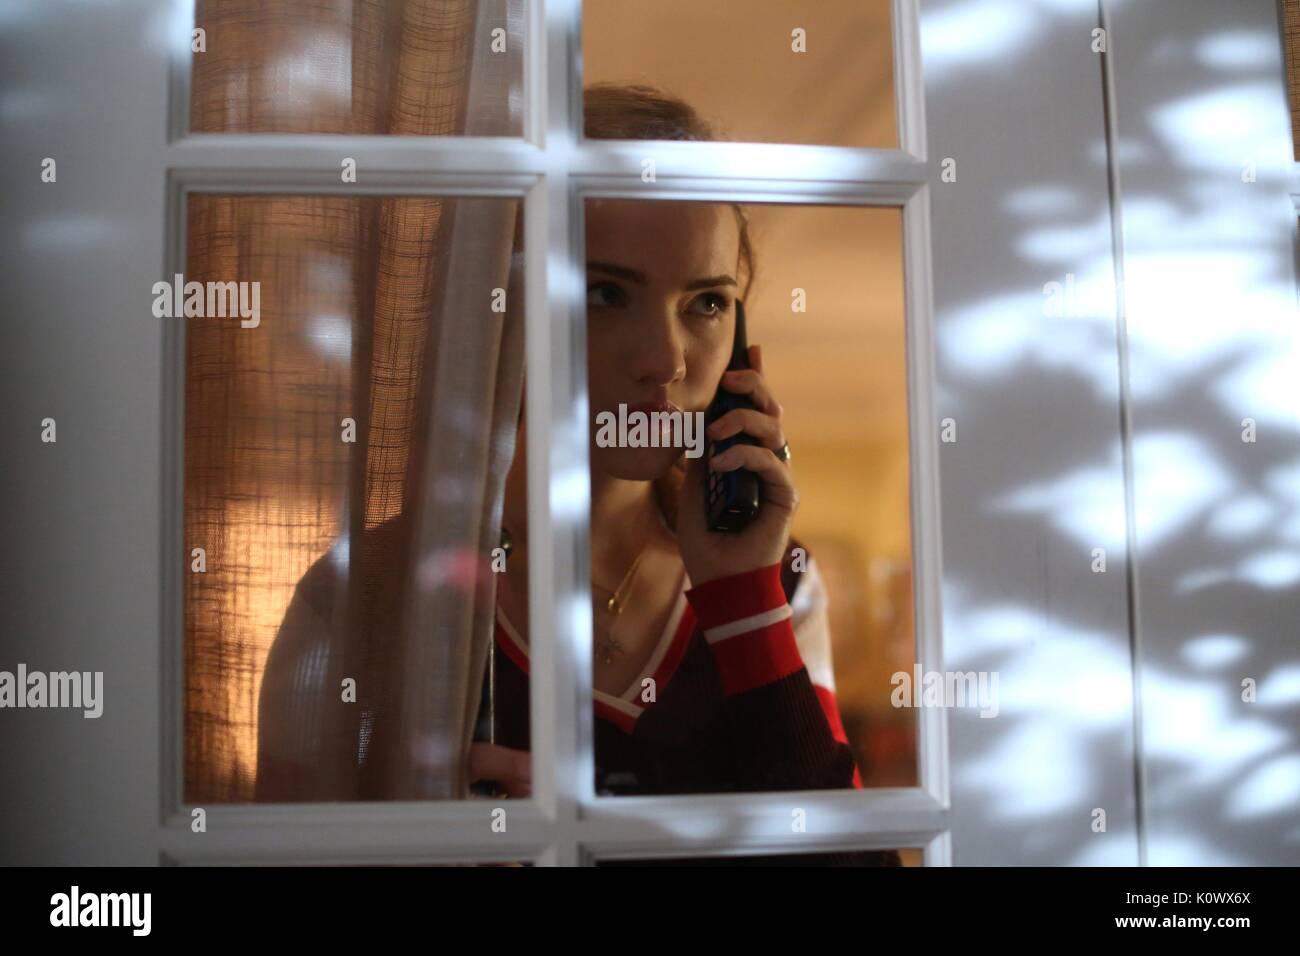 WILLA FITZGERALD SCREAM: THE TV SERIES (2015) - Stock Image